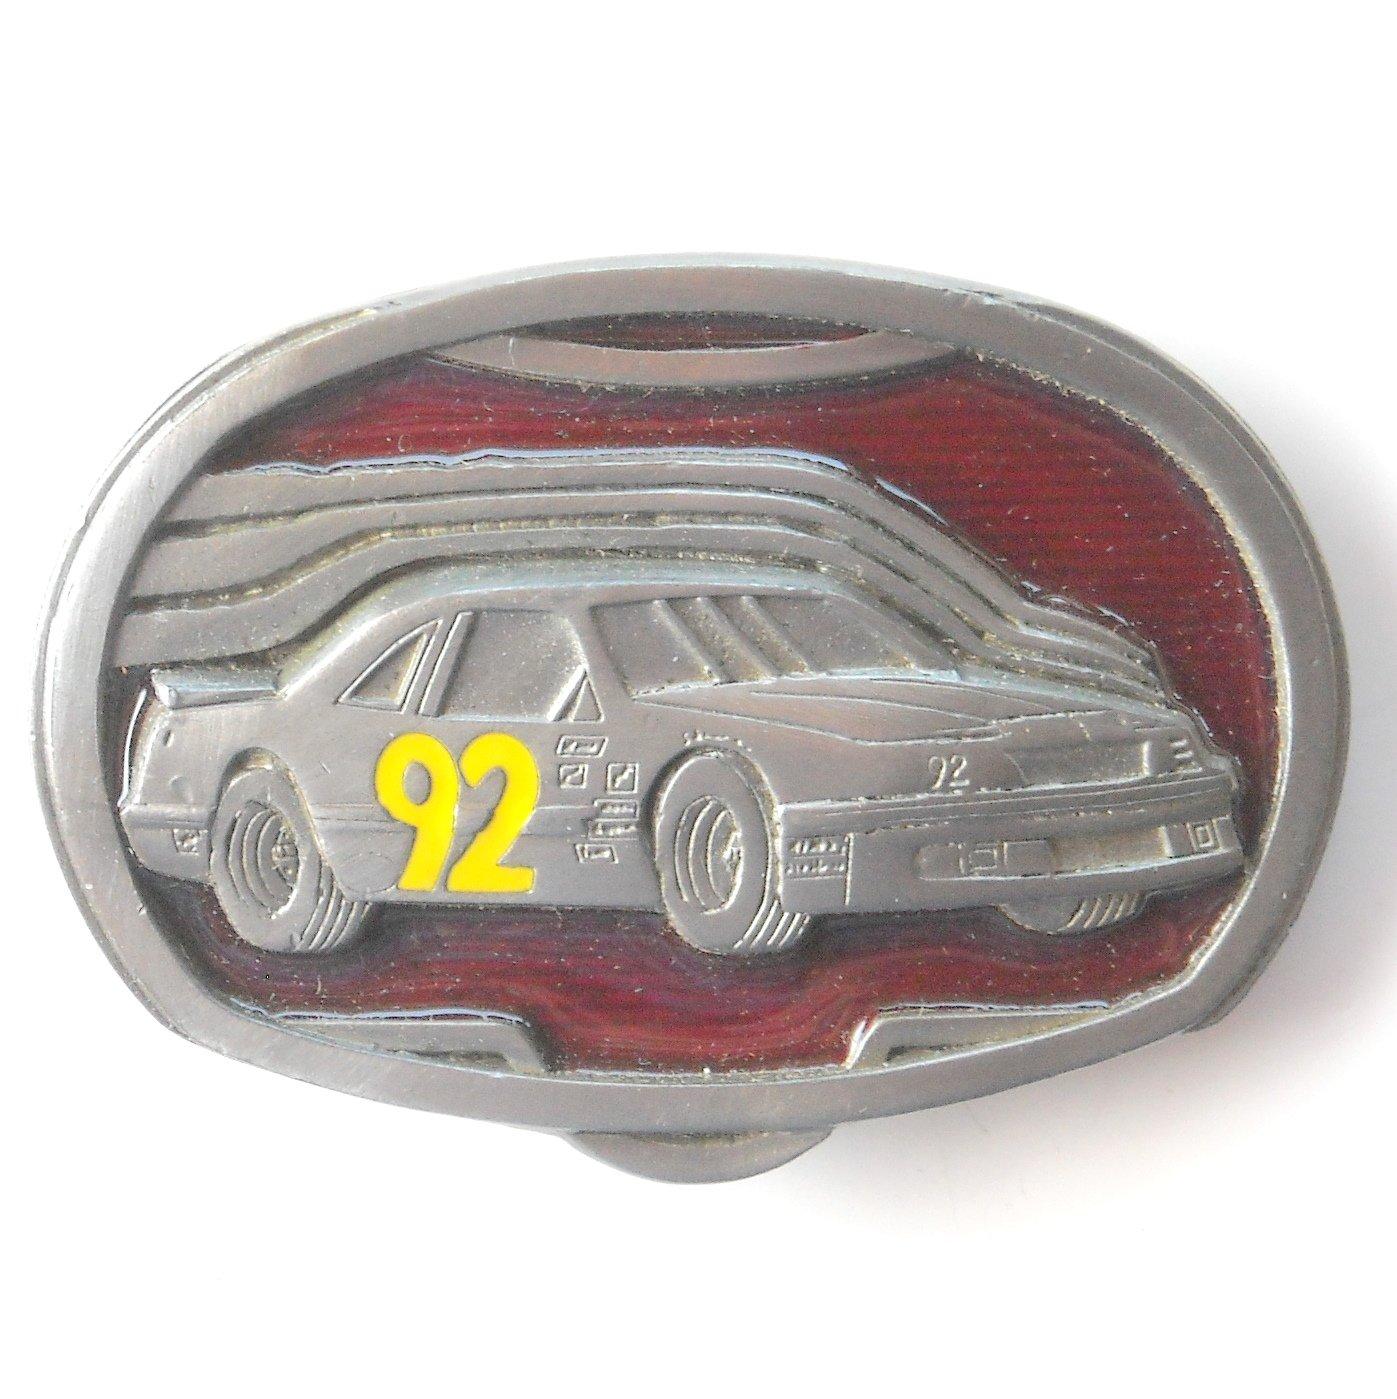 C+J 1992 Nascar Race Car 92 C&J Inc pewter alloy belt buckle +